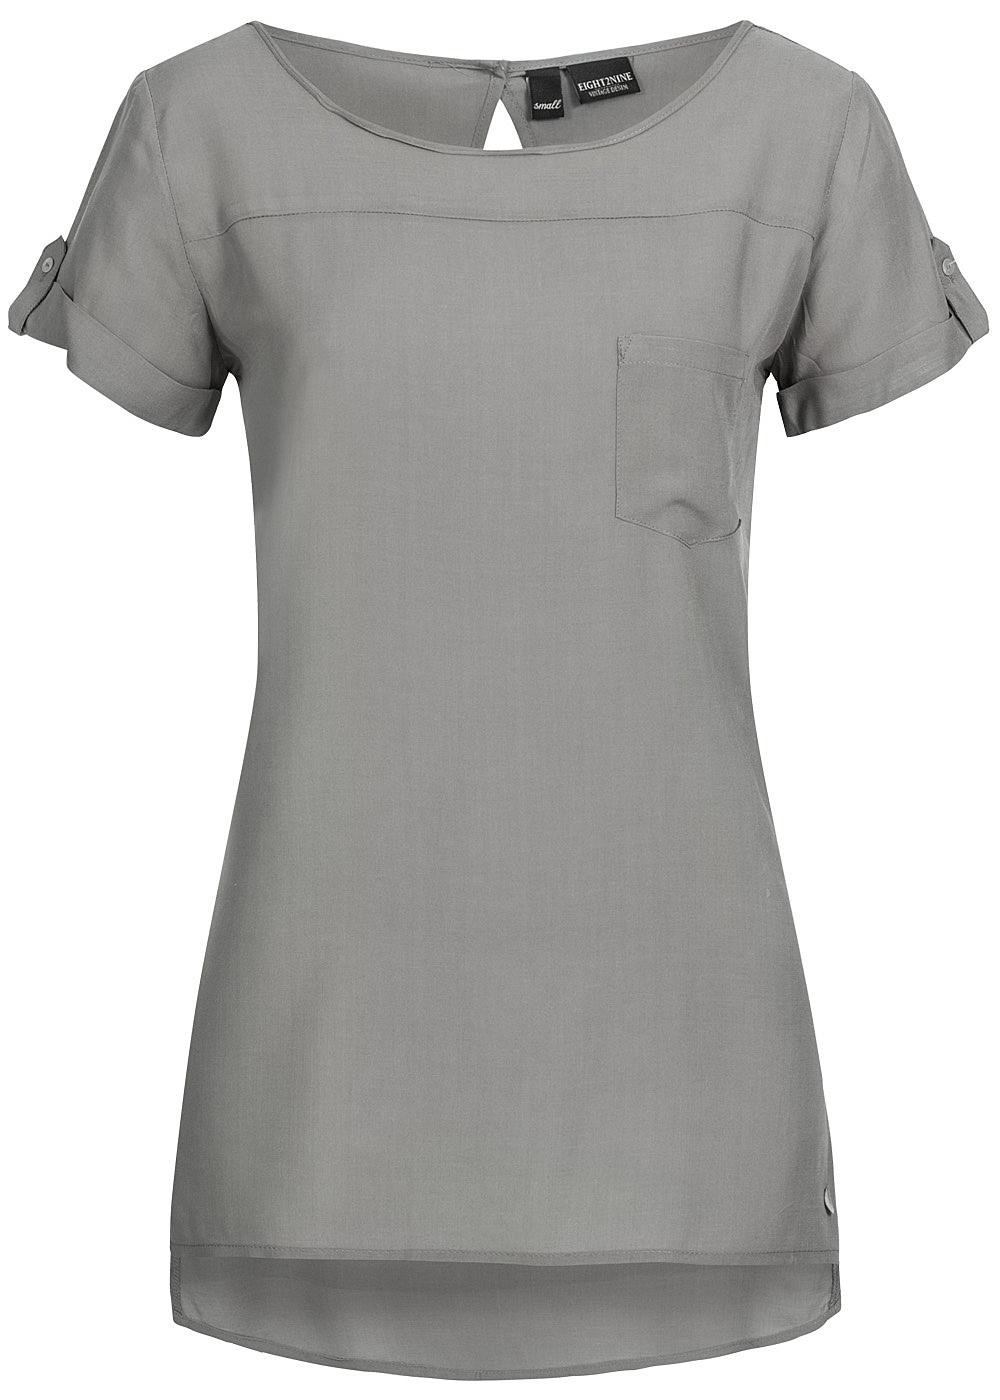 eight2nine damen t shirt brusttasche hinten l nger mocha. Black Bedroom Furniture Sets. Home Design Ideas